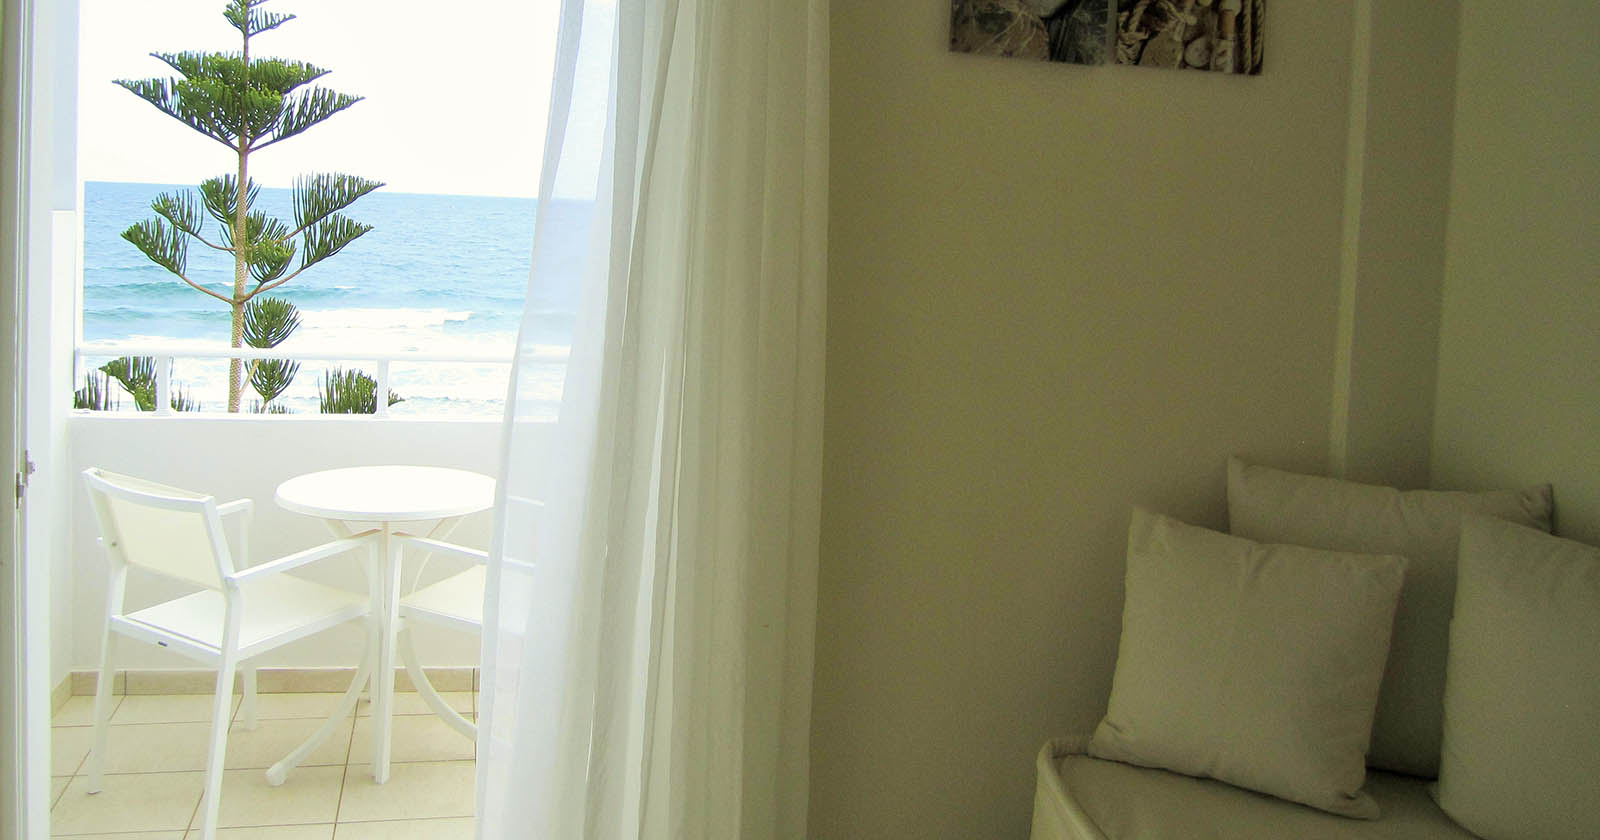 HotelBrain, Proud PR Ambassador Of The Small Luxury Hotels Of The World For Greece, Turkey & Lebanon